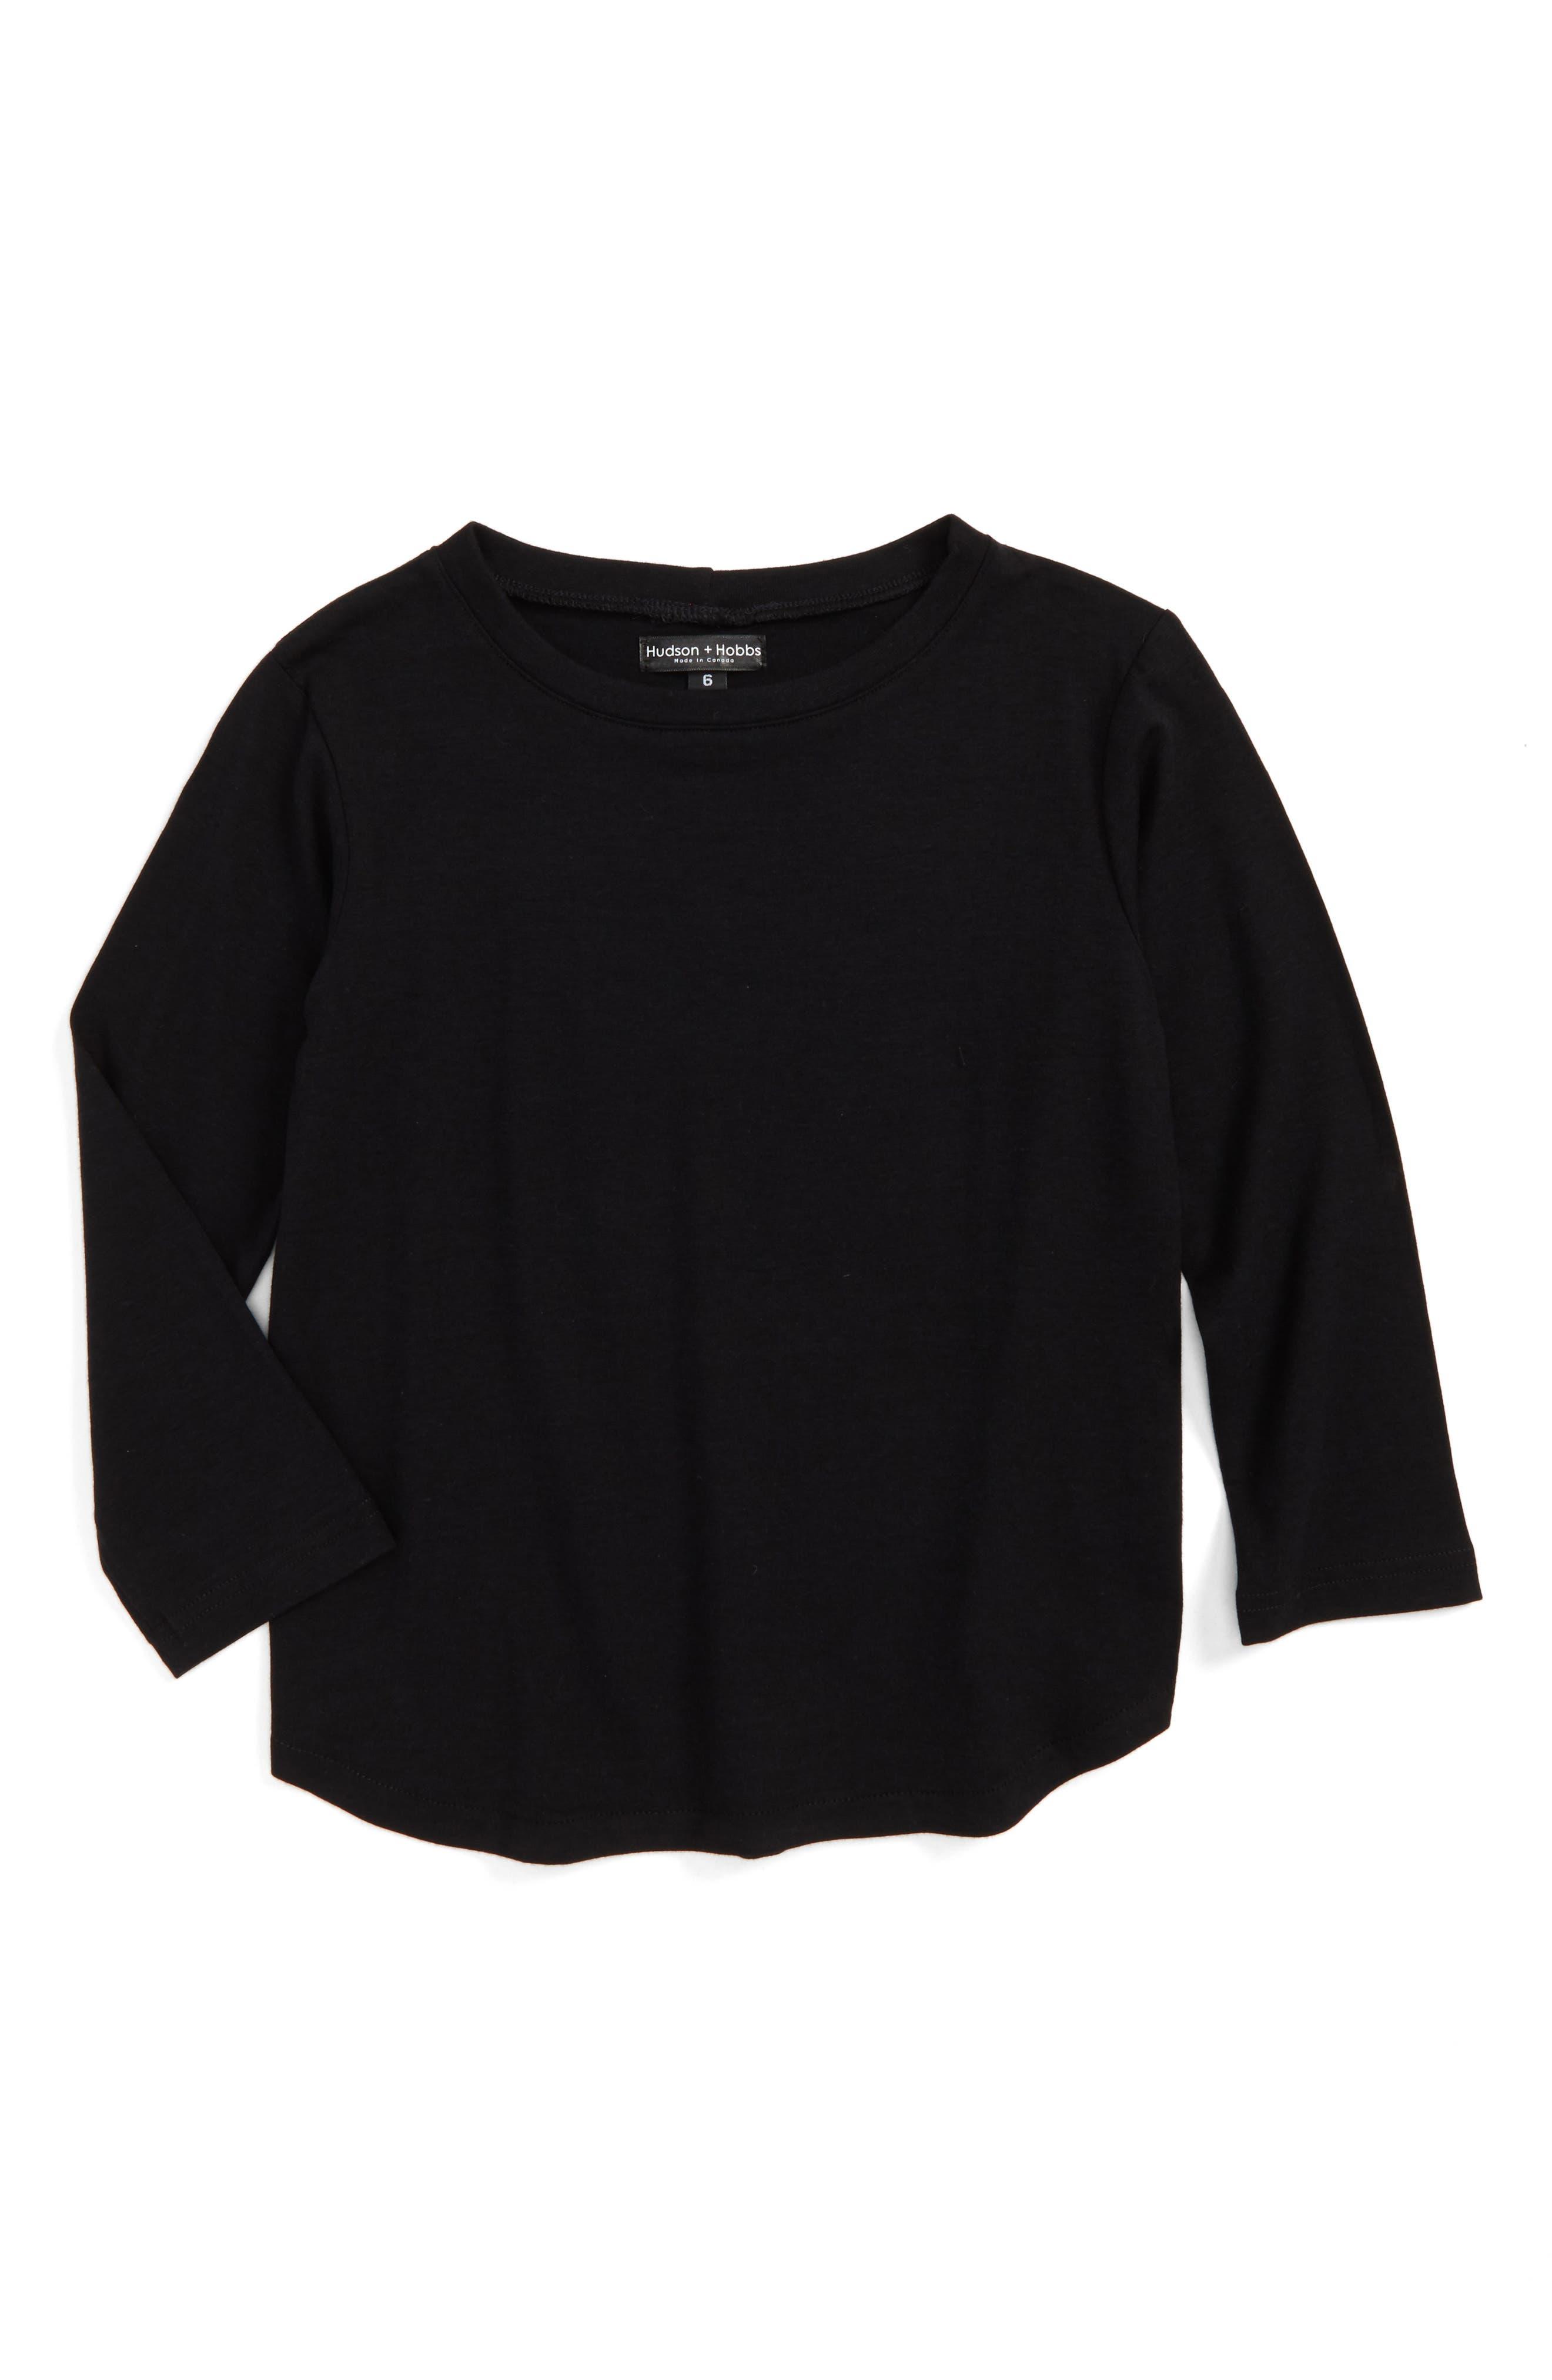 Hudson + Hobbs Long Sleeve T-Shirt (Toddler Boys, Little Boys & Big Boys)